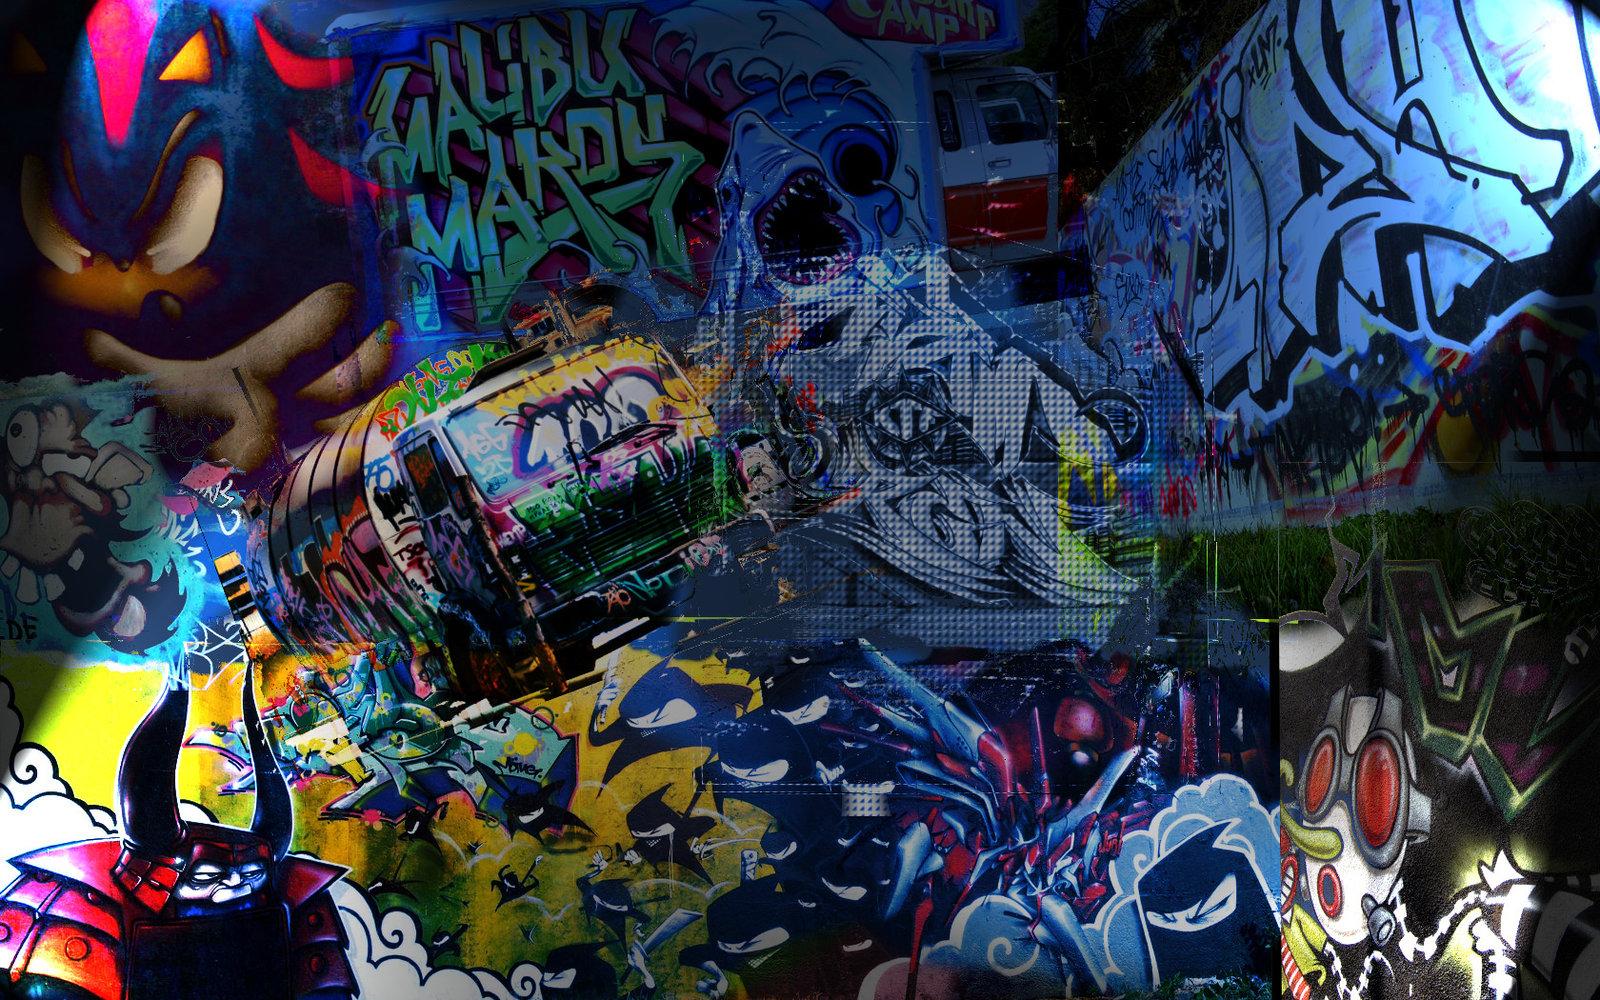 graffiti rebellion underground hip hop street art